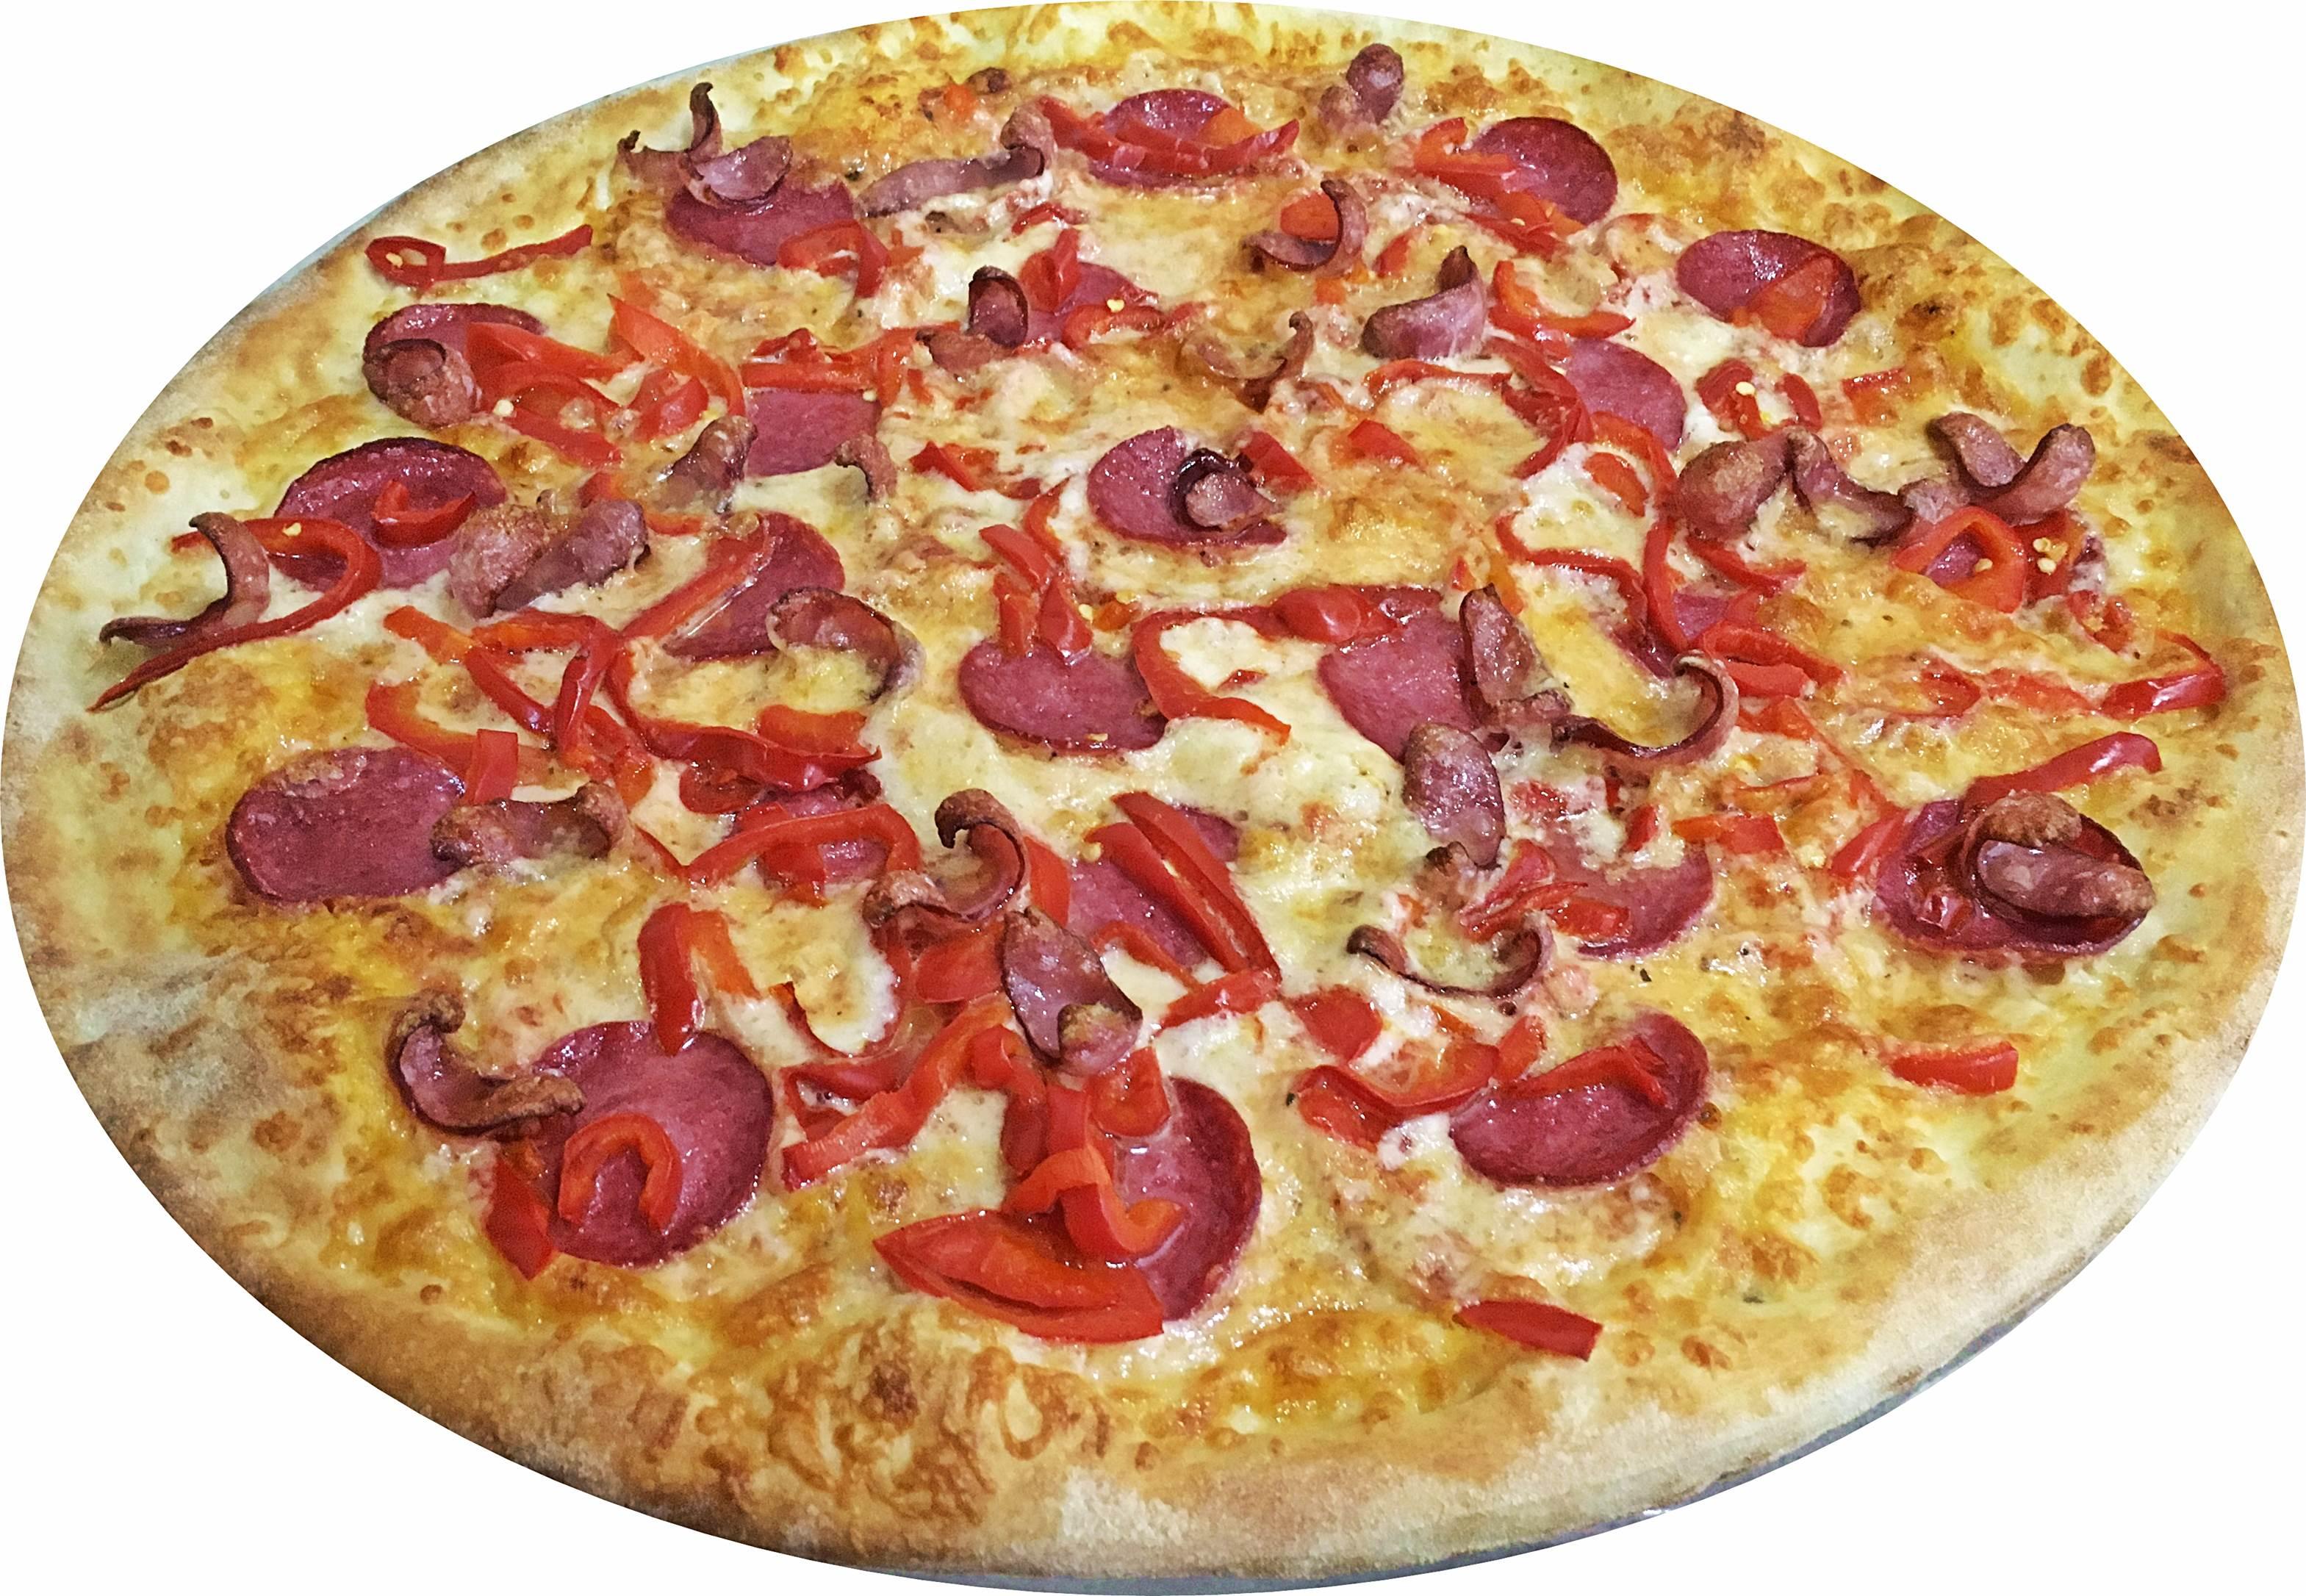 Pizza PROSCILITO - Antonio Kasprzaka Łódź